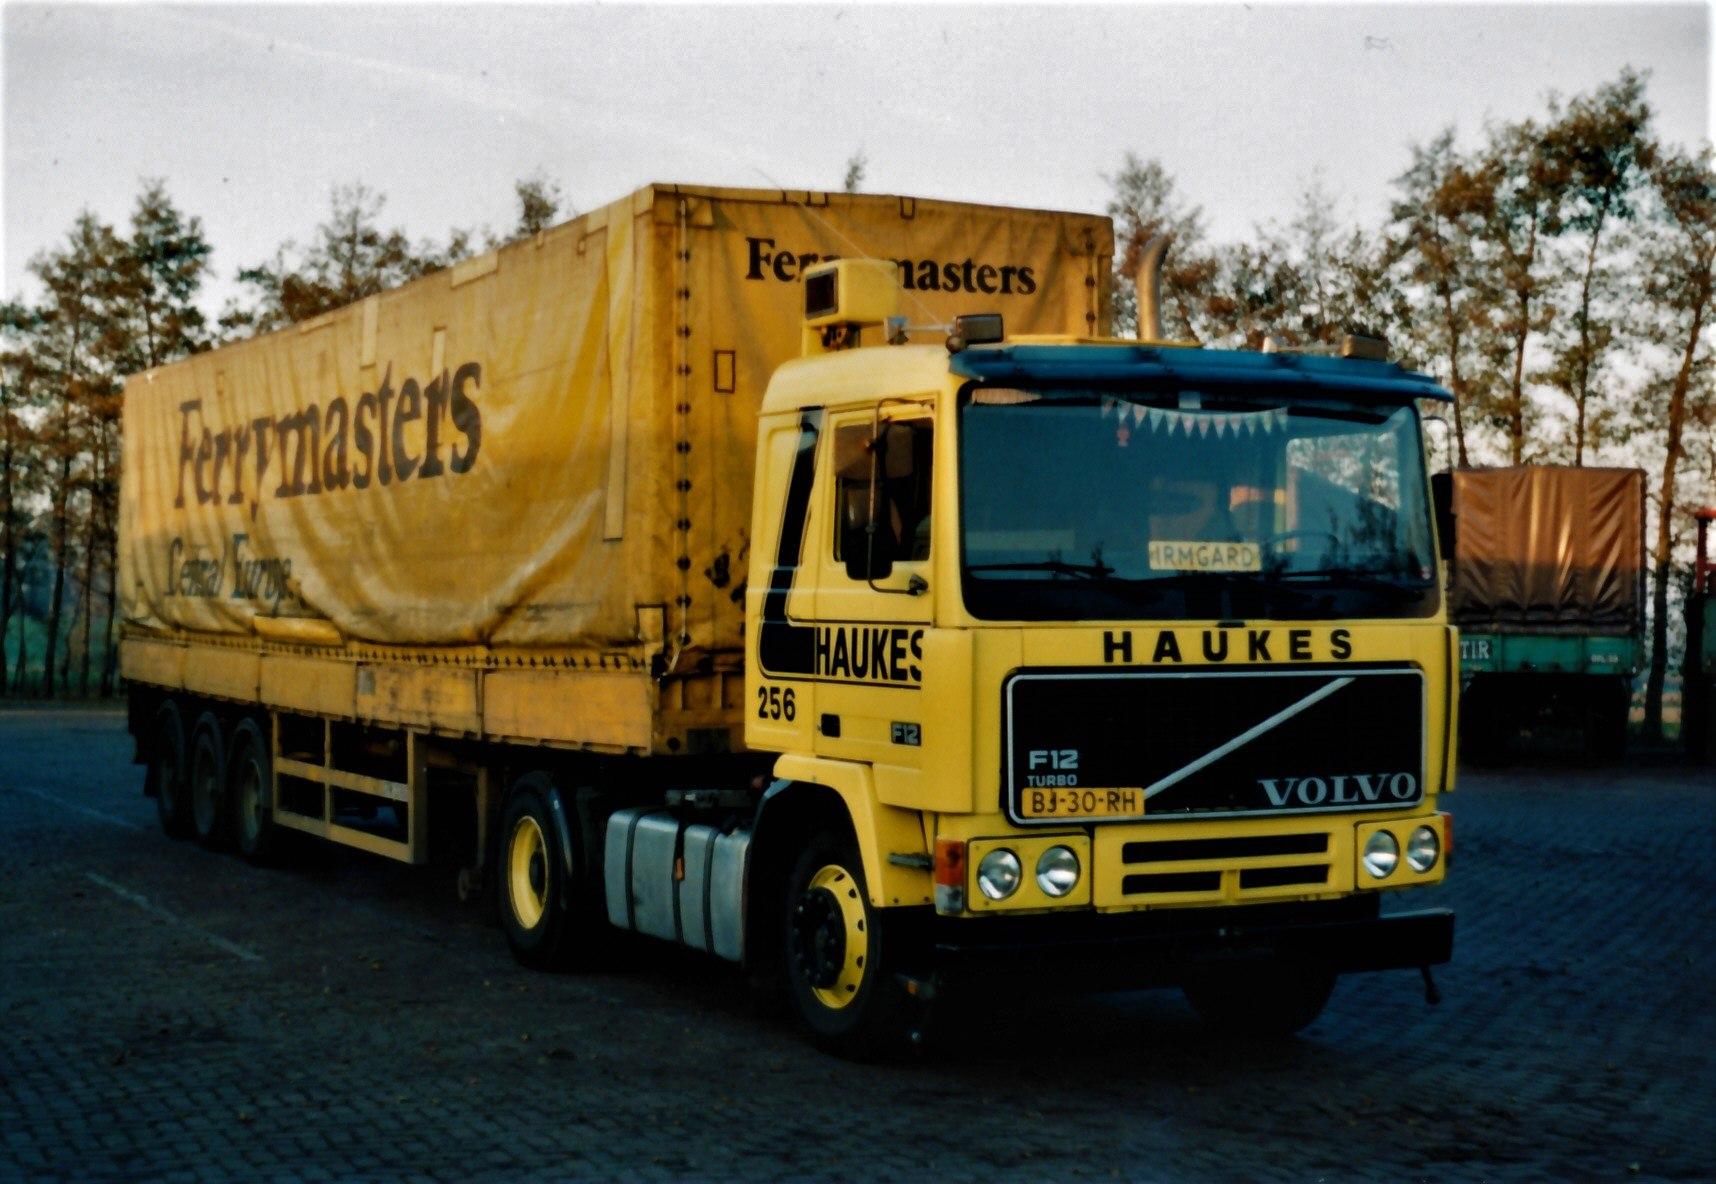 Han-Megens--Volvo-F12-nr-256-met-een-Ferry-Master-oplegger